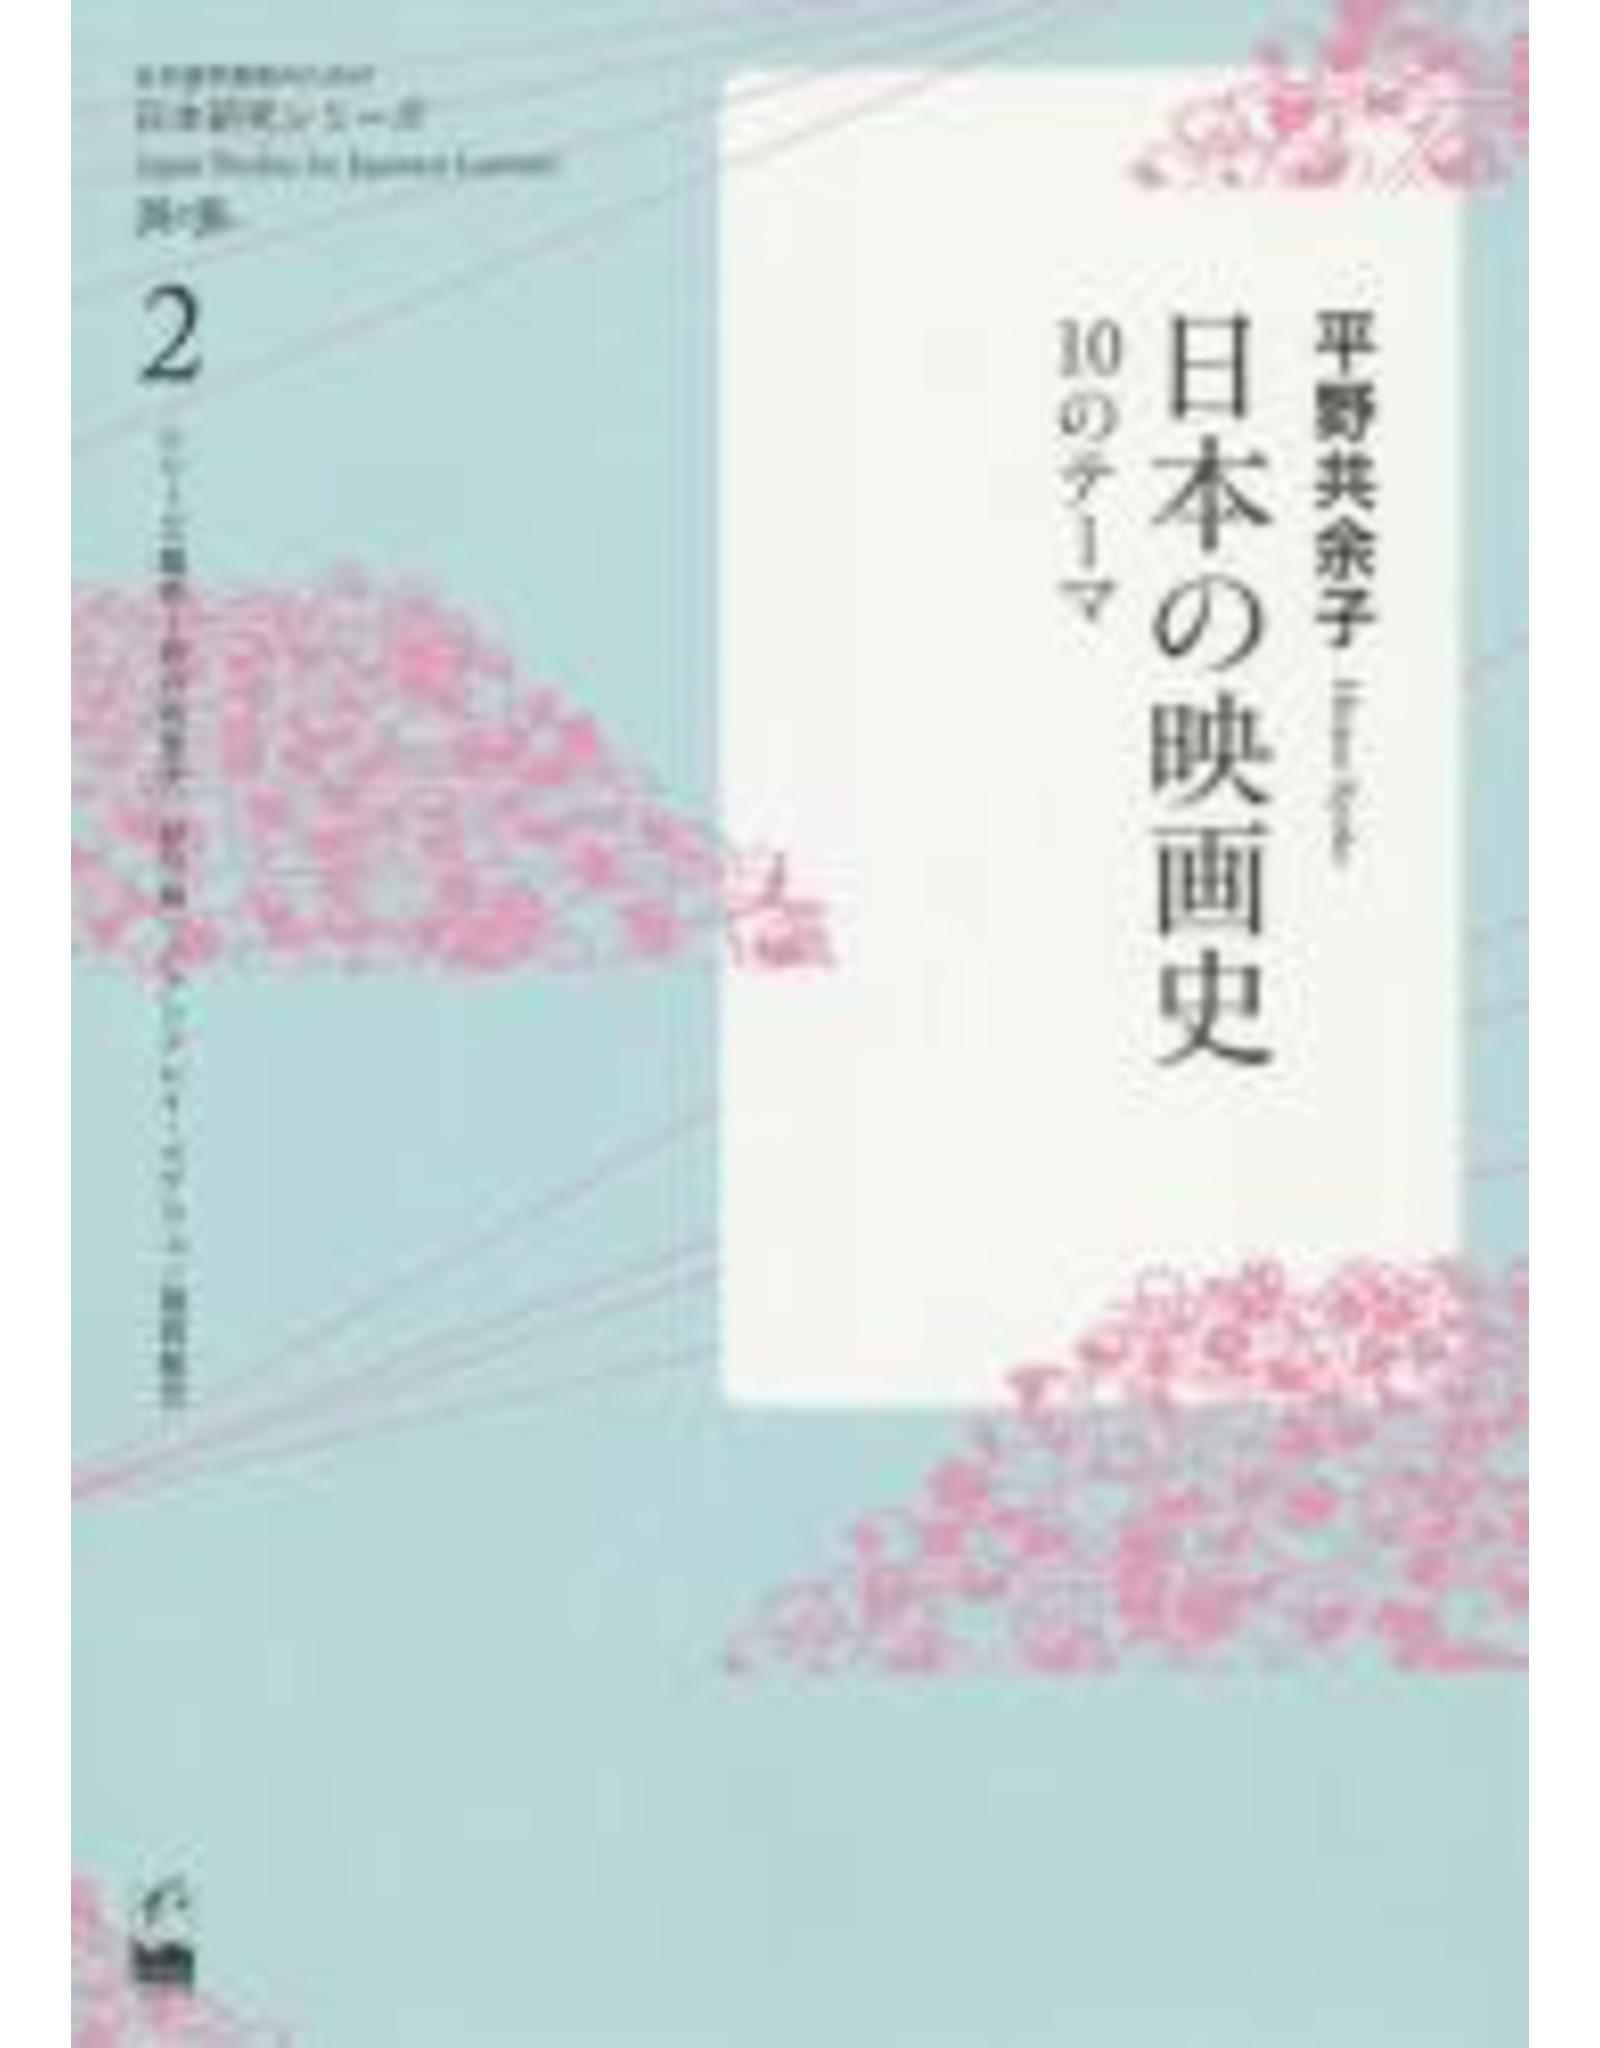 KUROSHIO JAPAN STUDIES FOR JAPANESE LEARNERS - NIHON NO EIGASHI